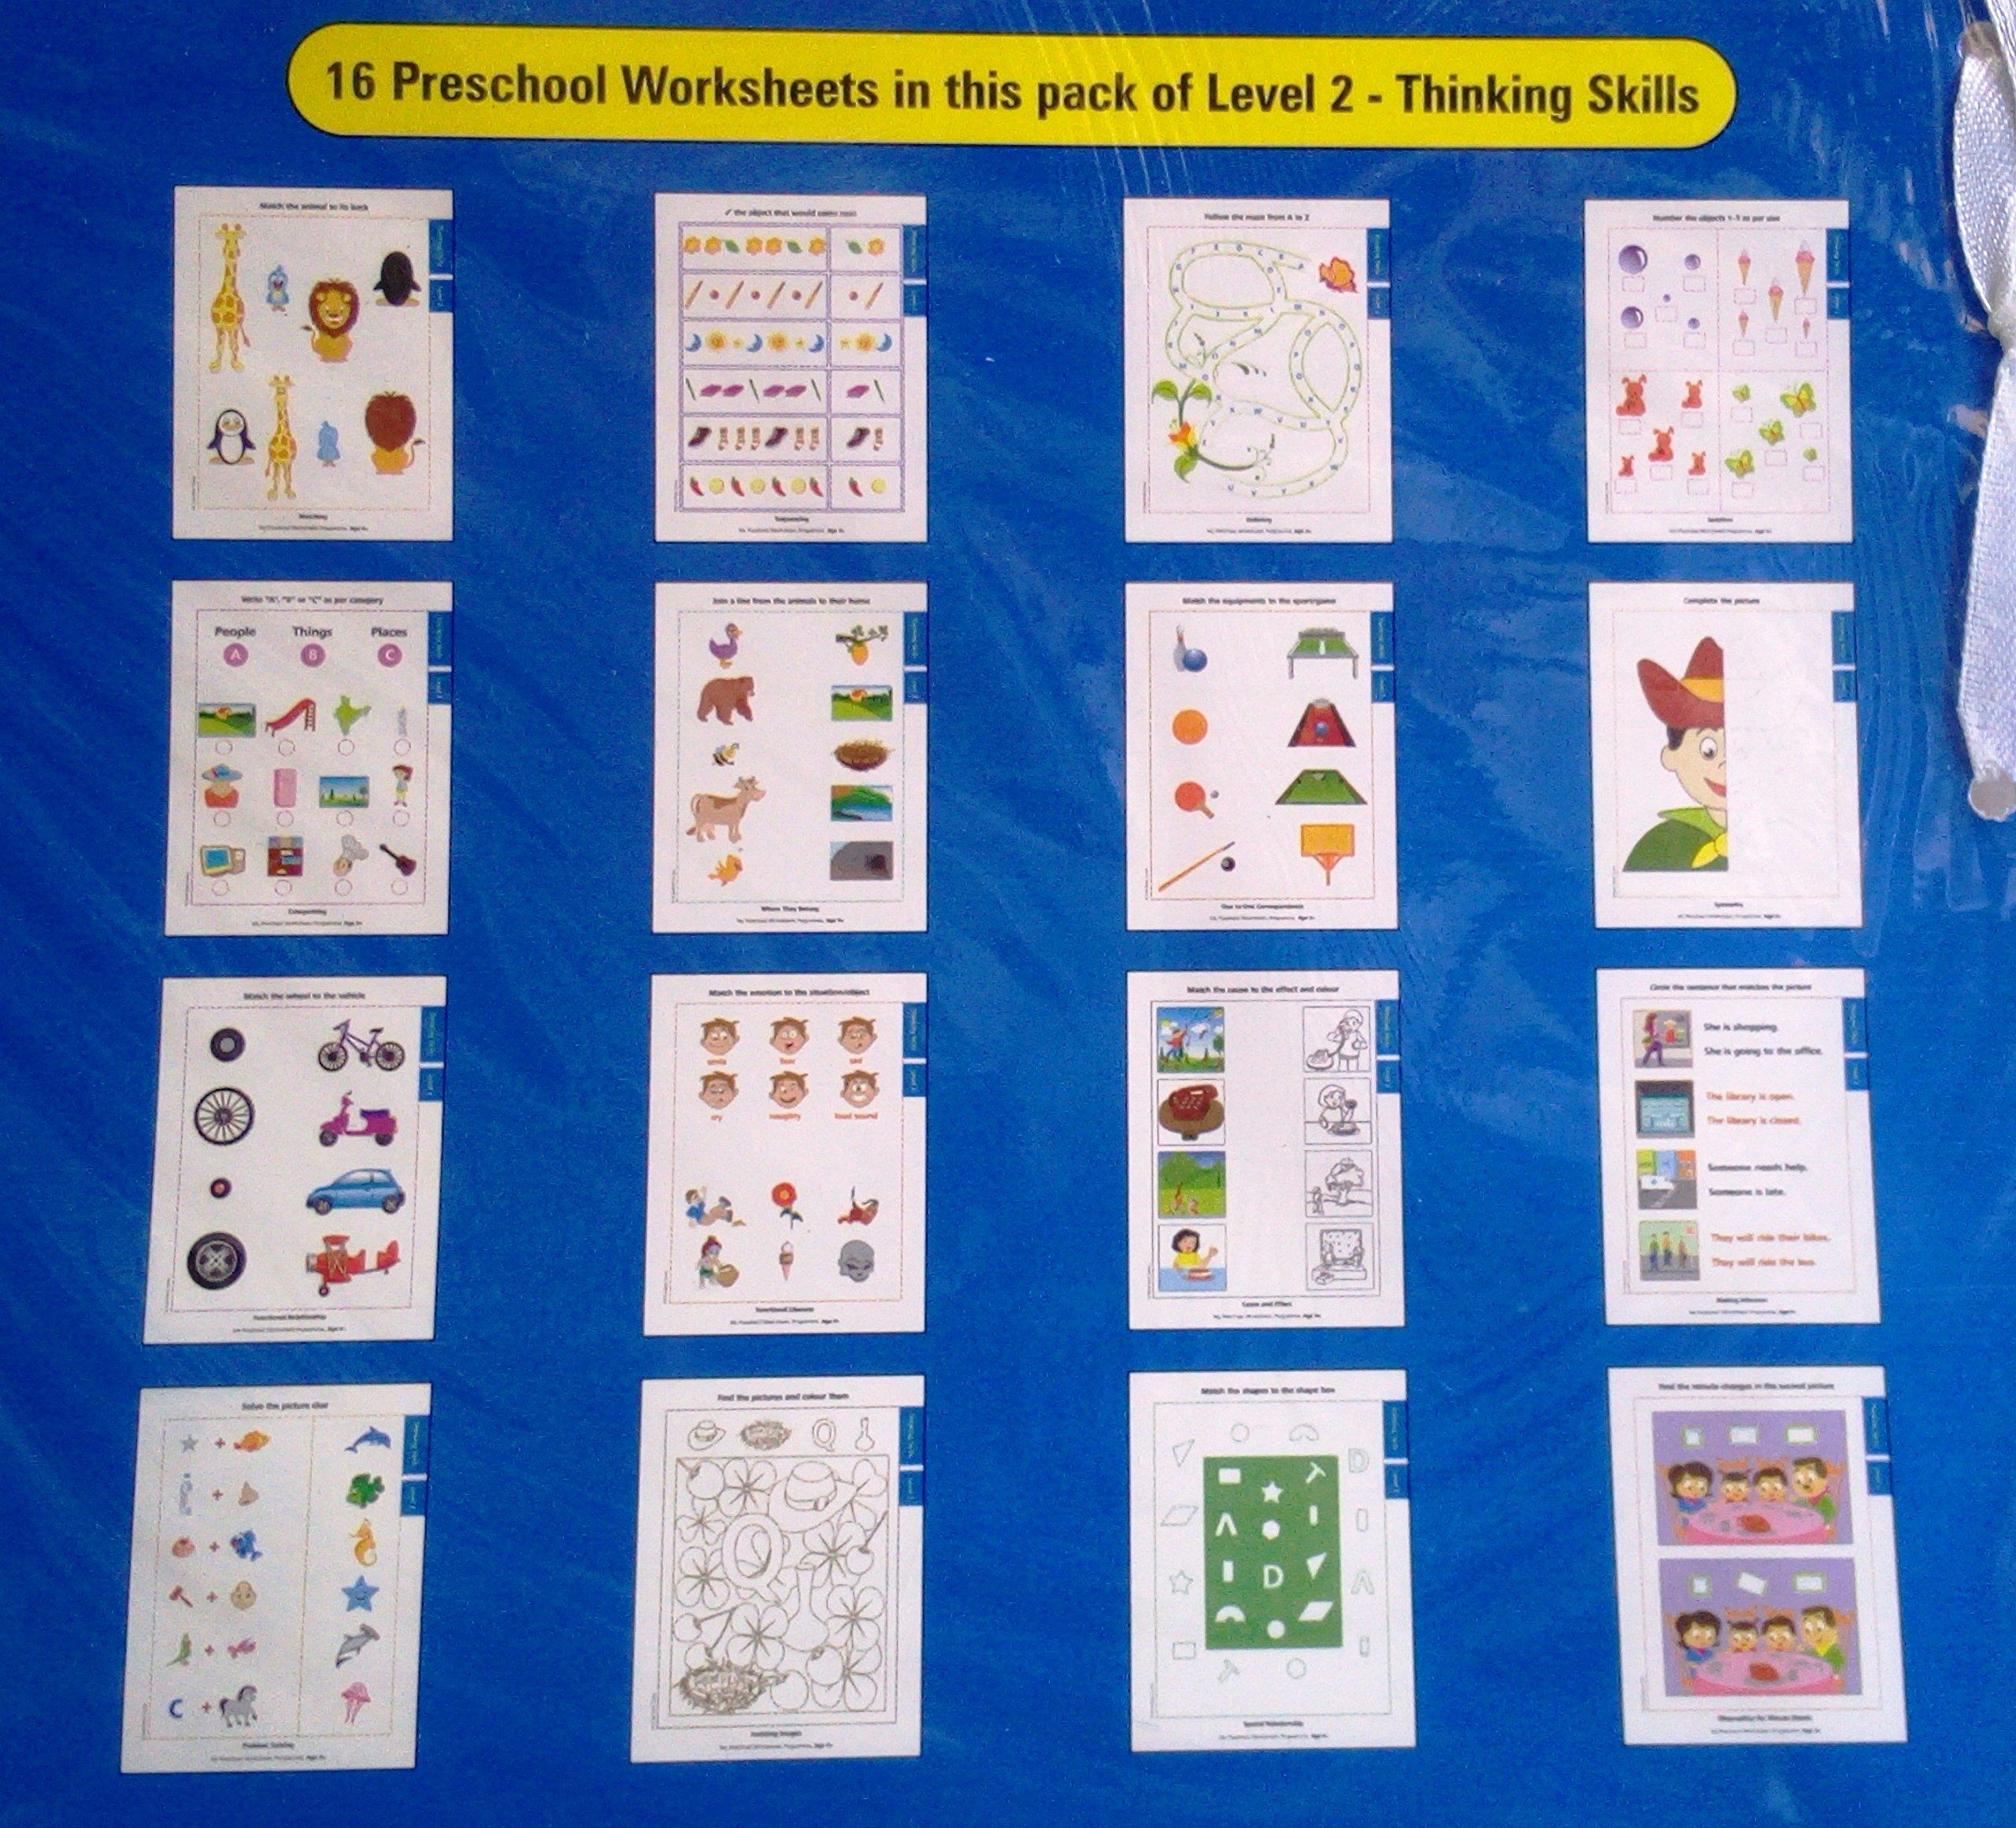 Buy My Preschool Worksheets Programme Thinking Skills Level 2 Book ...